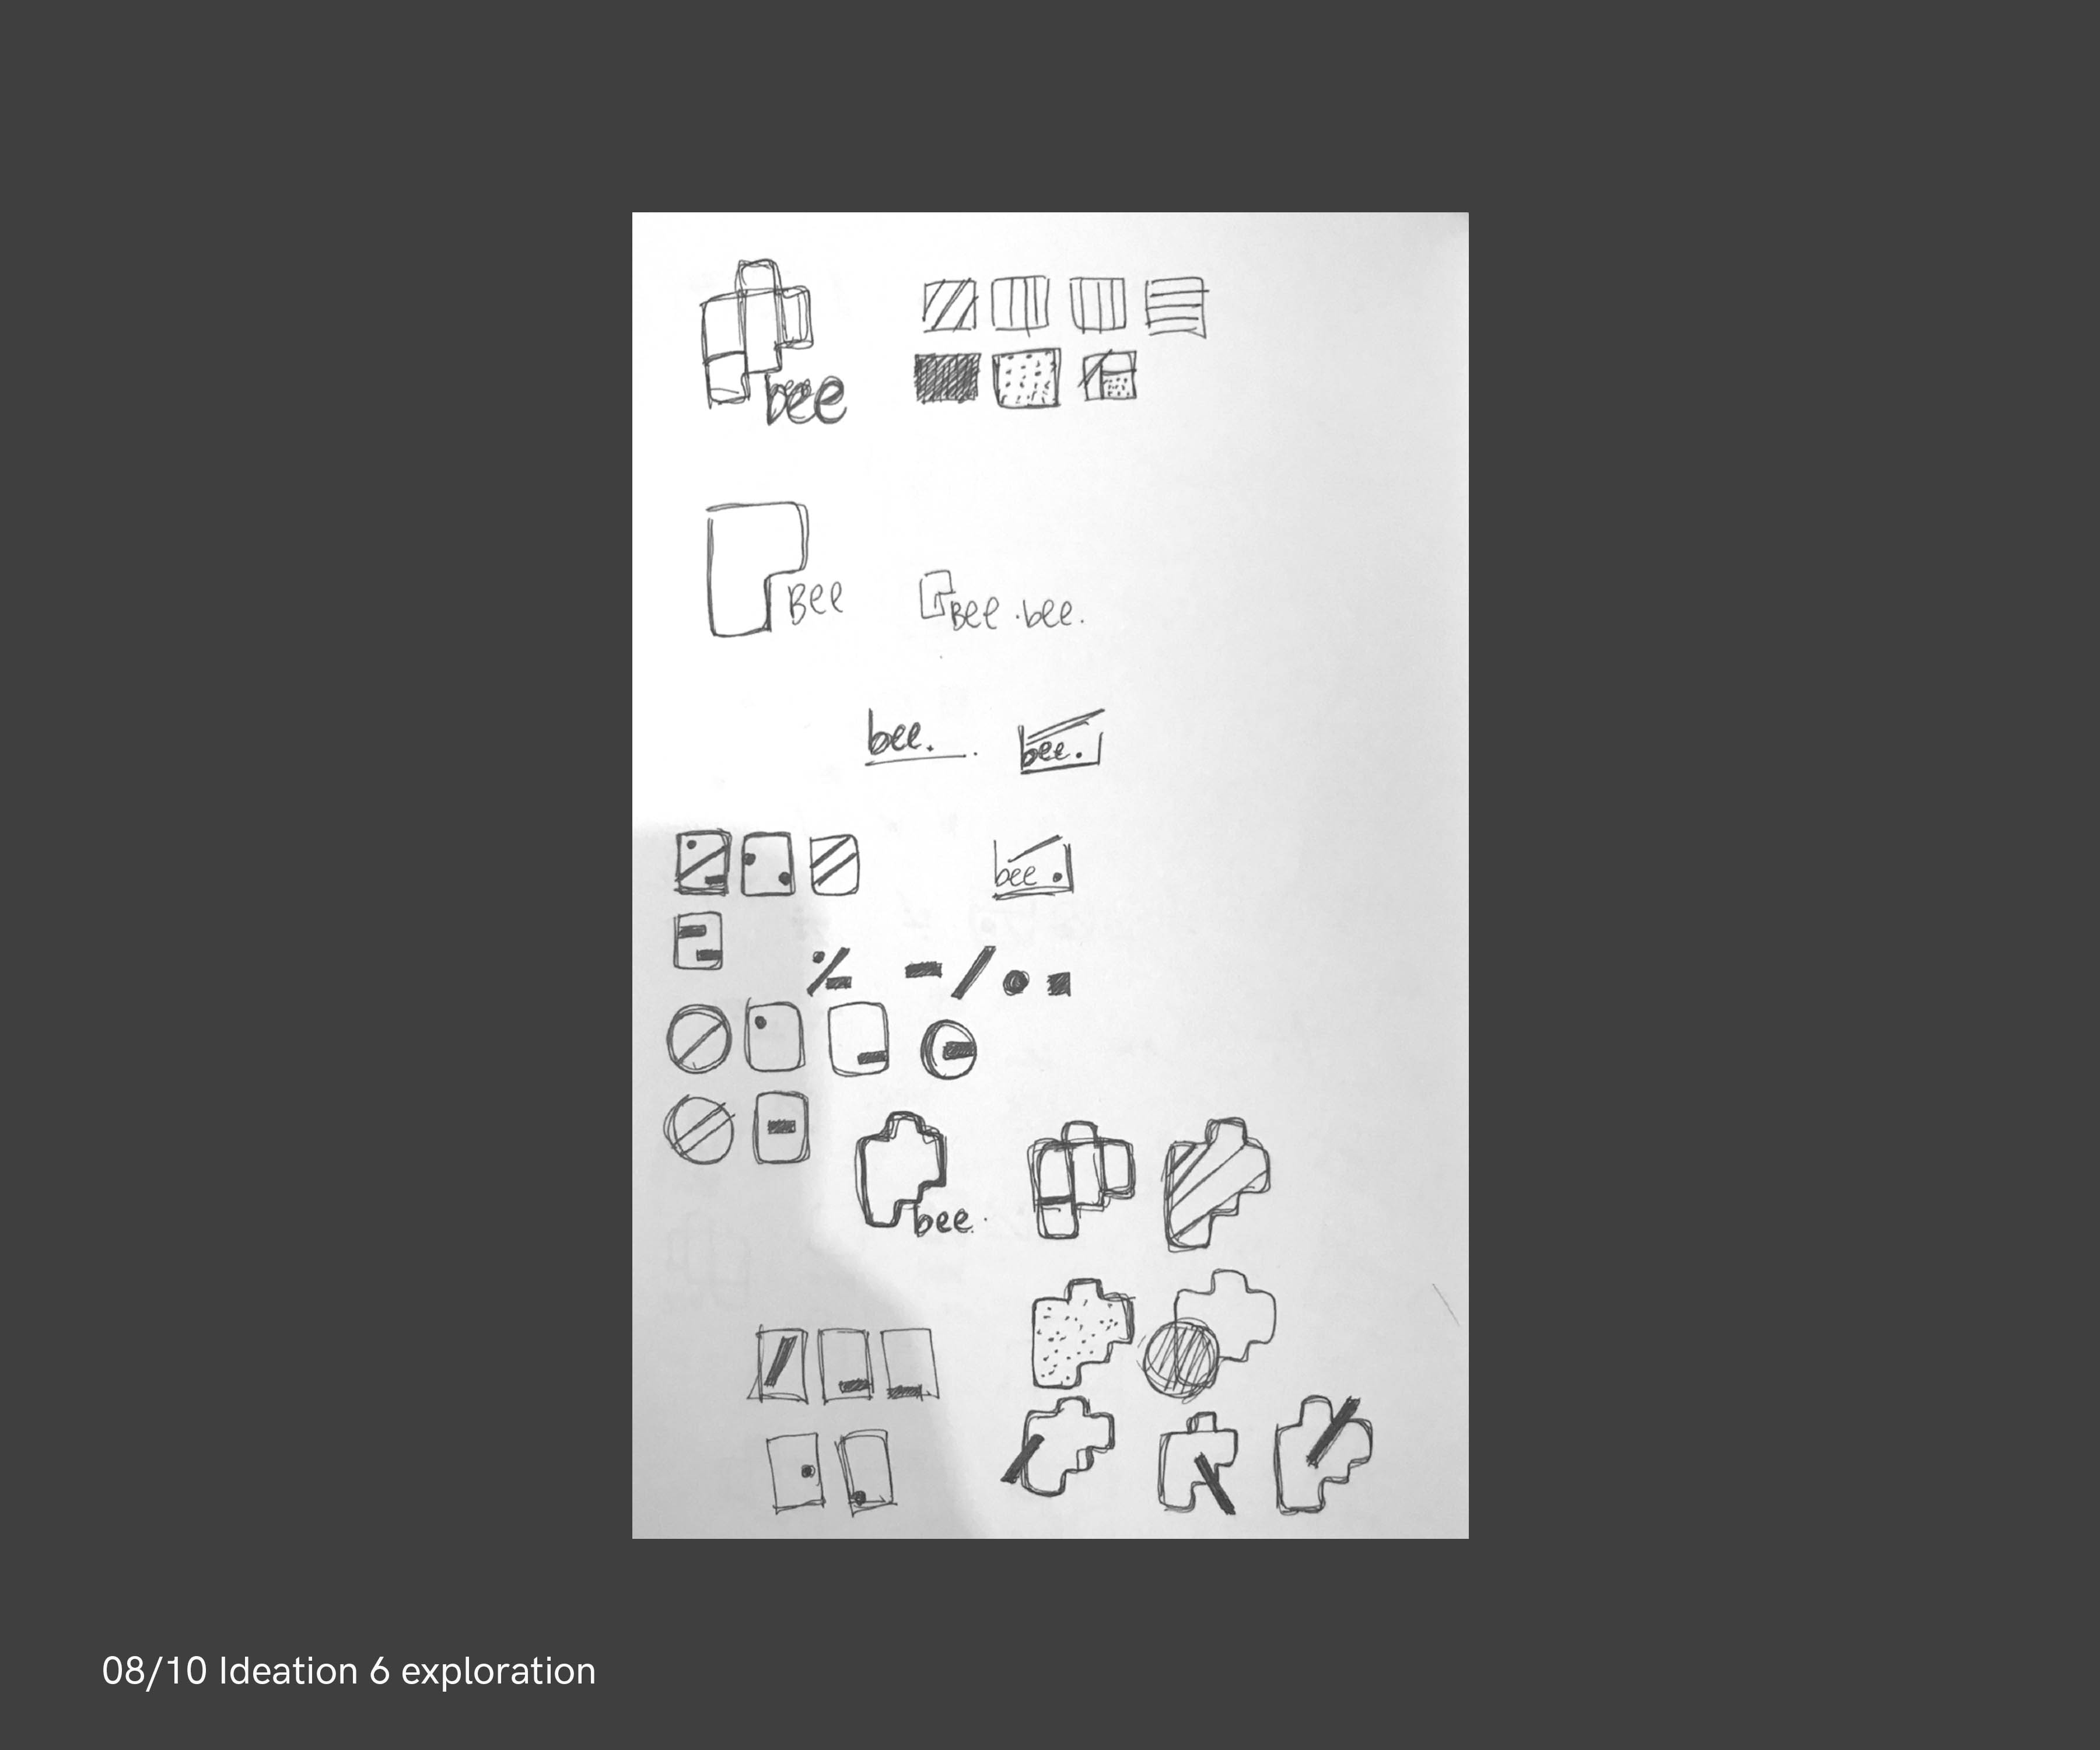 b_process_logo1_sketches-8.1